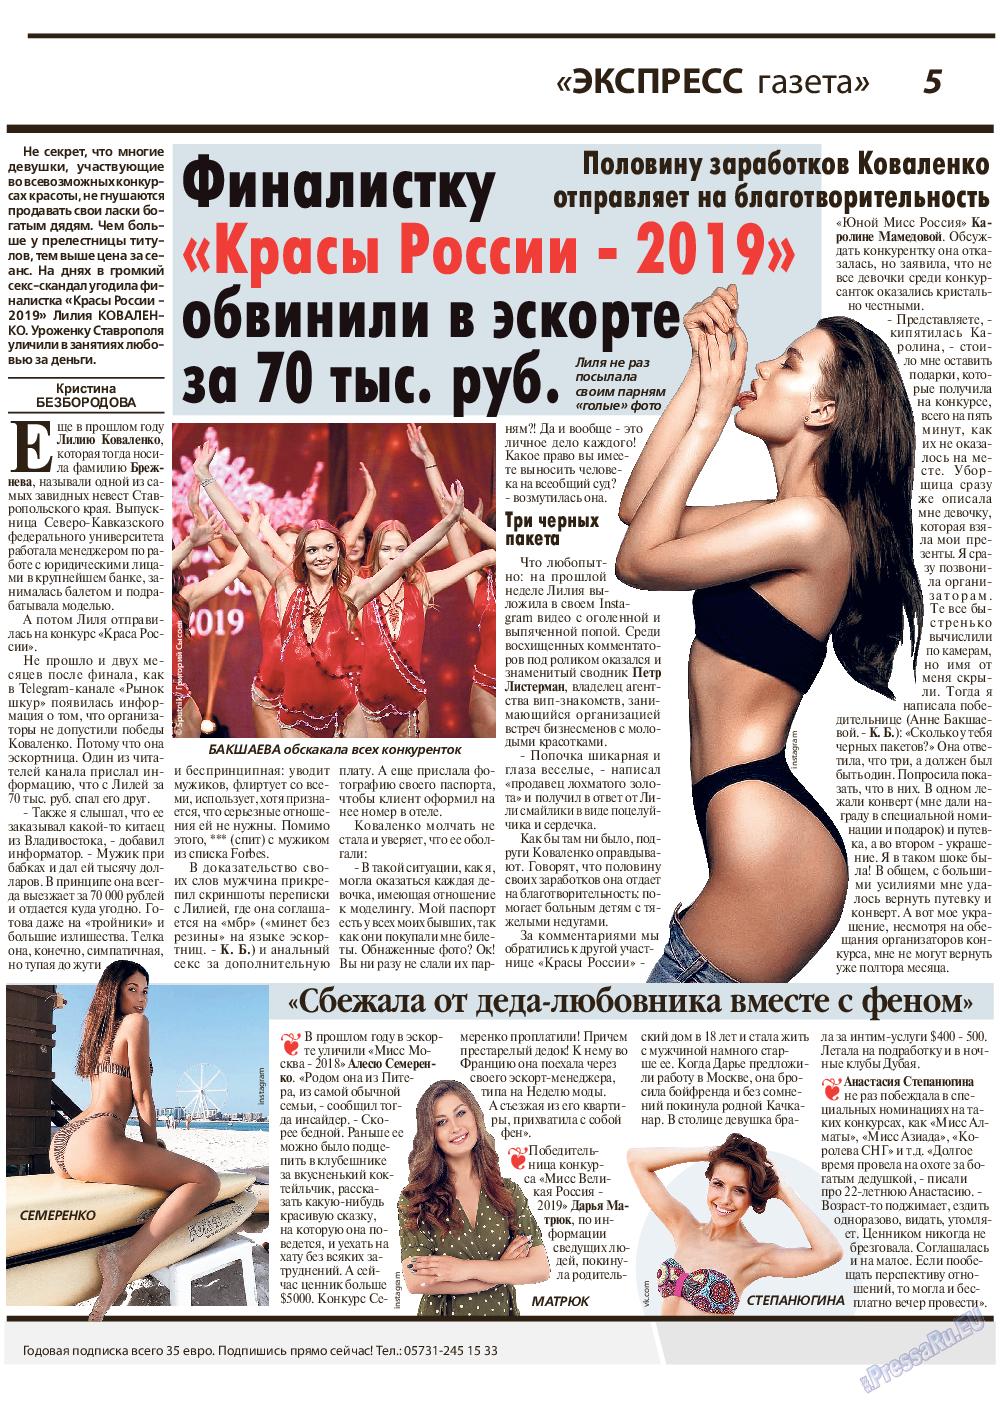 Экспресс газета (газета). 2019 год, номер 9, стр. 5